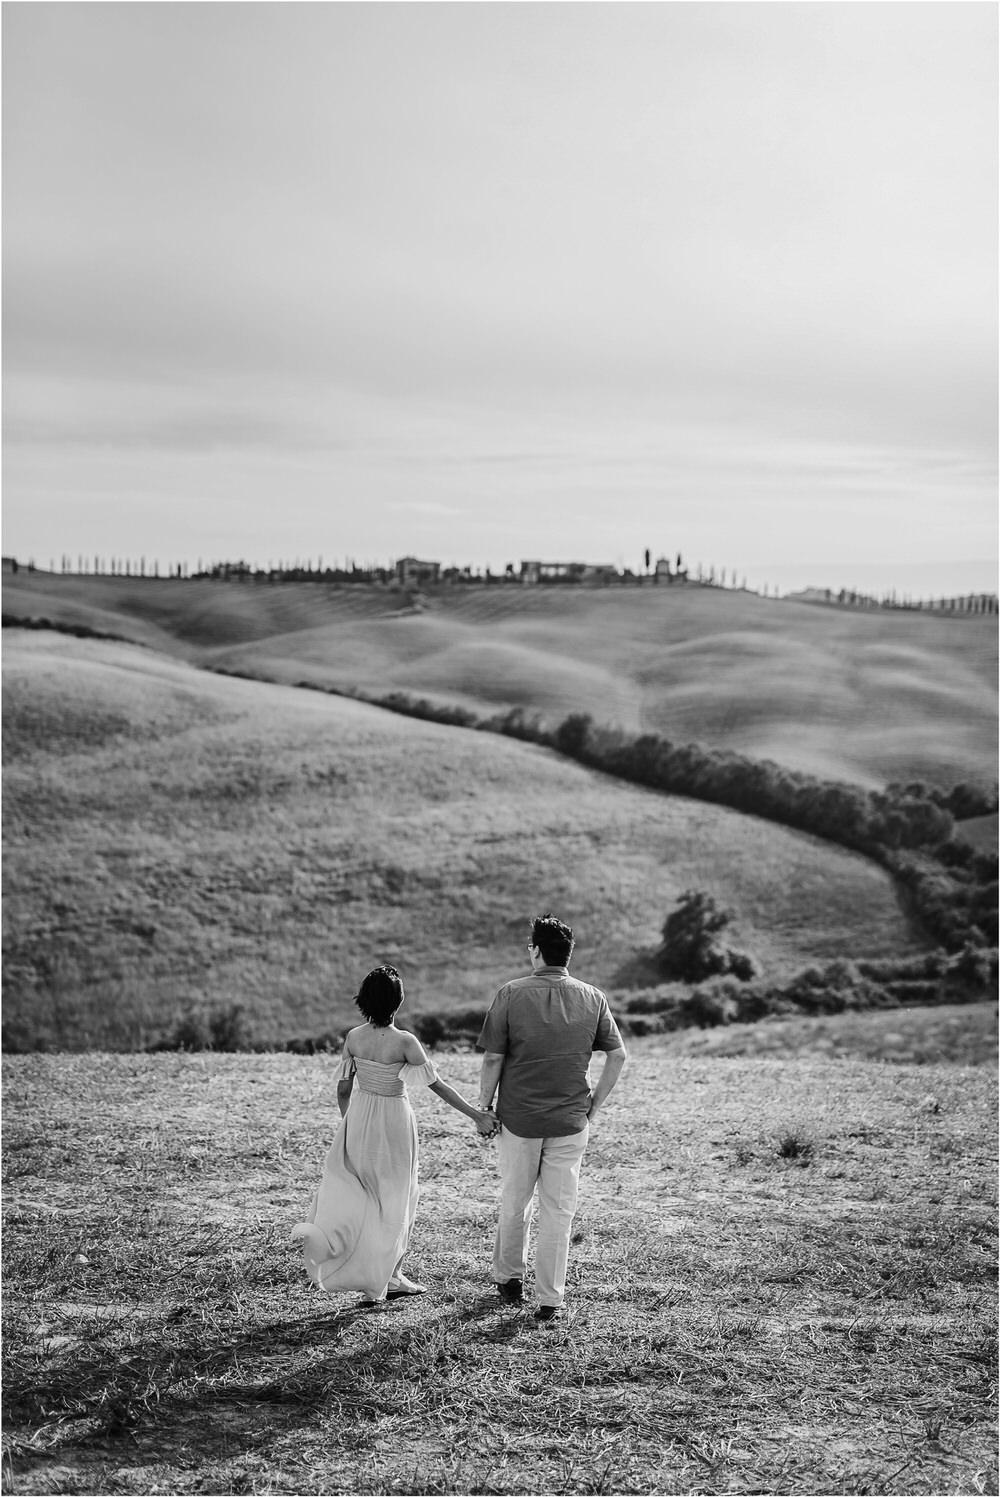 tuscany siena wedding anniversary honeymoon photography photographer italy matrimonio destination val d'orcia toscana 0045.jpg